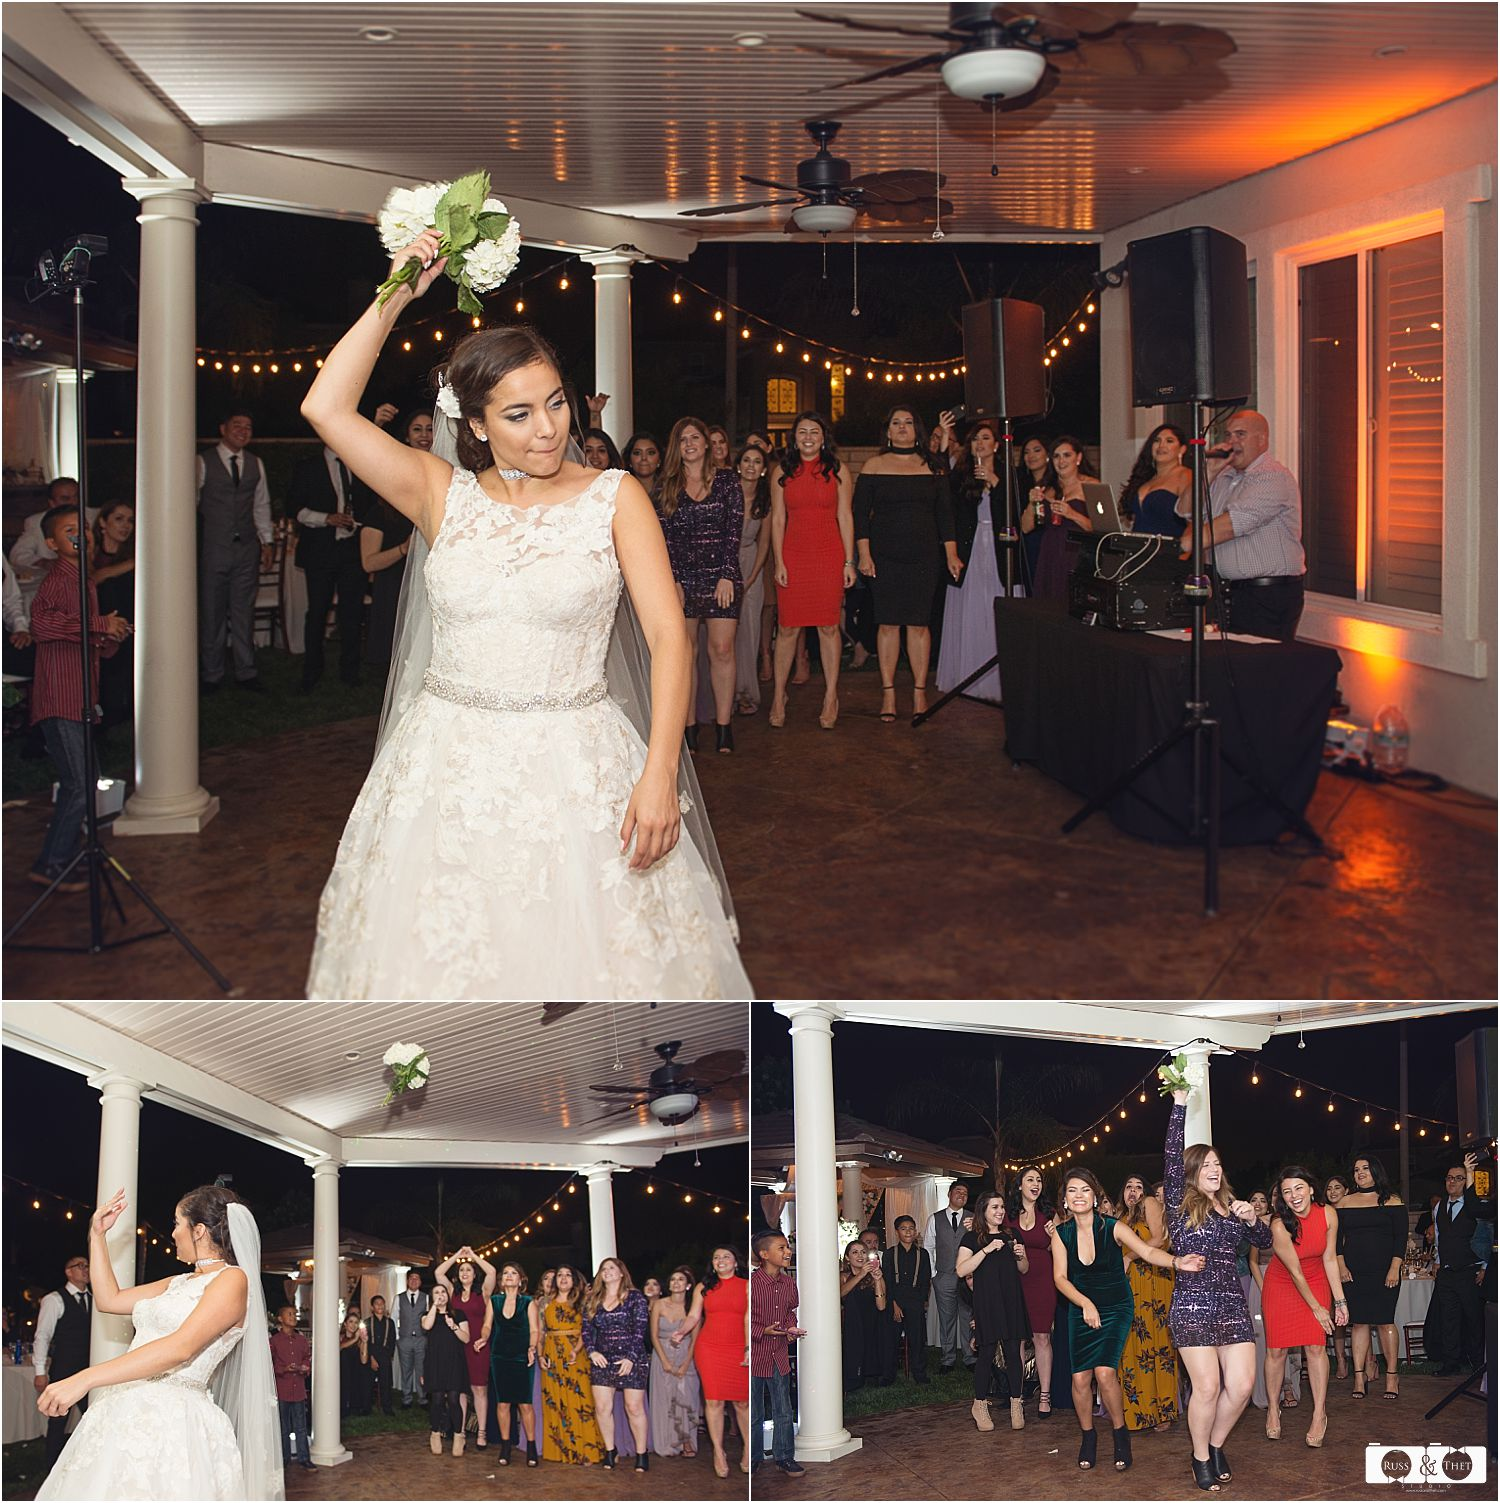 San-bernardino-county-wedding-photographer (7).jpg